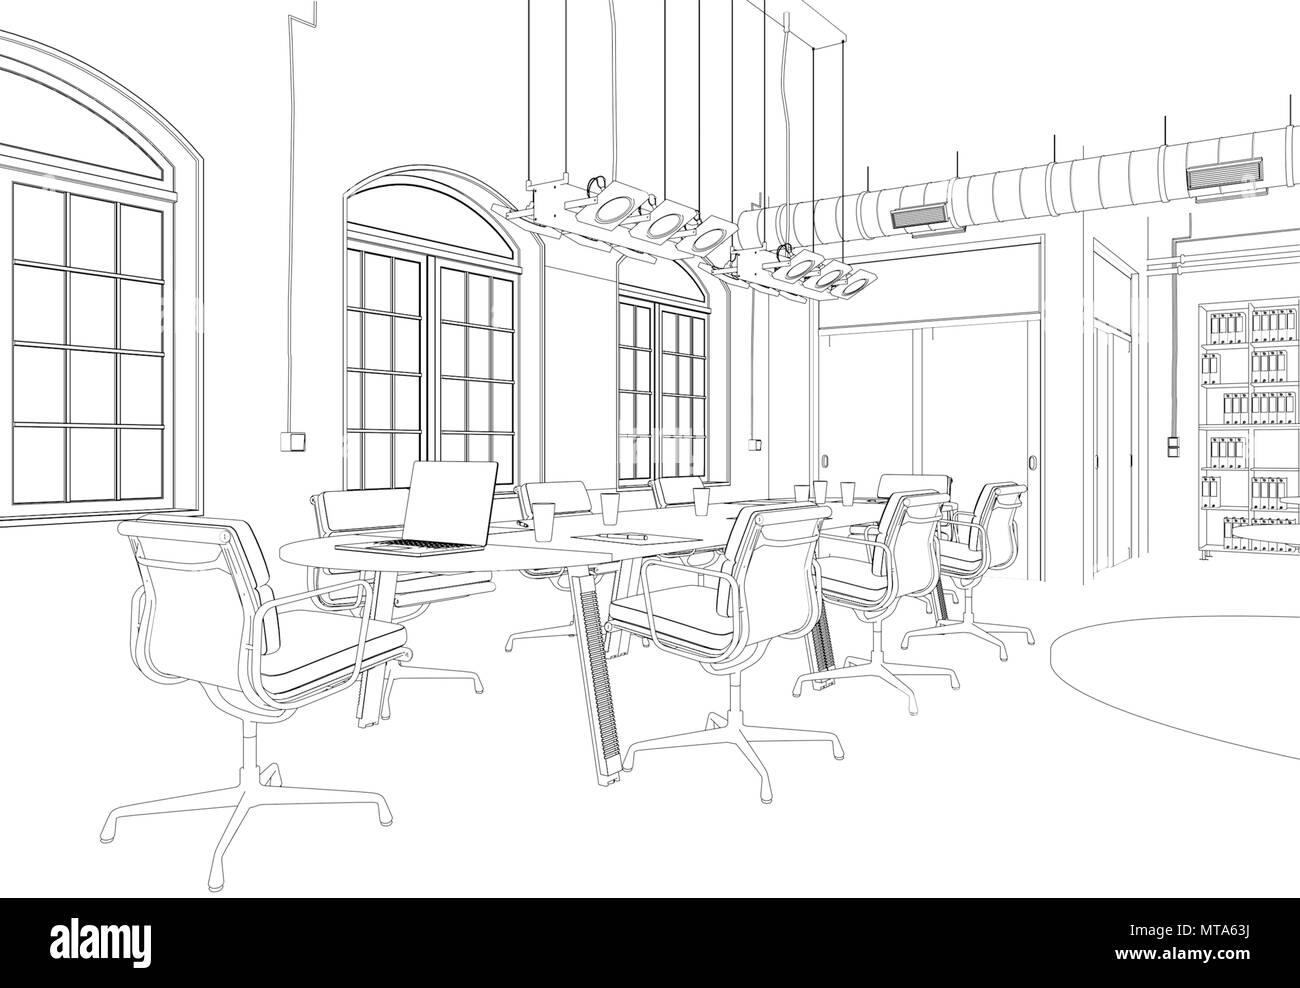 Interior Design Big Office Room With Desks Custom Drawing Stock Photo Alamy